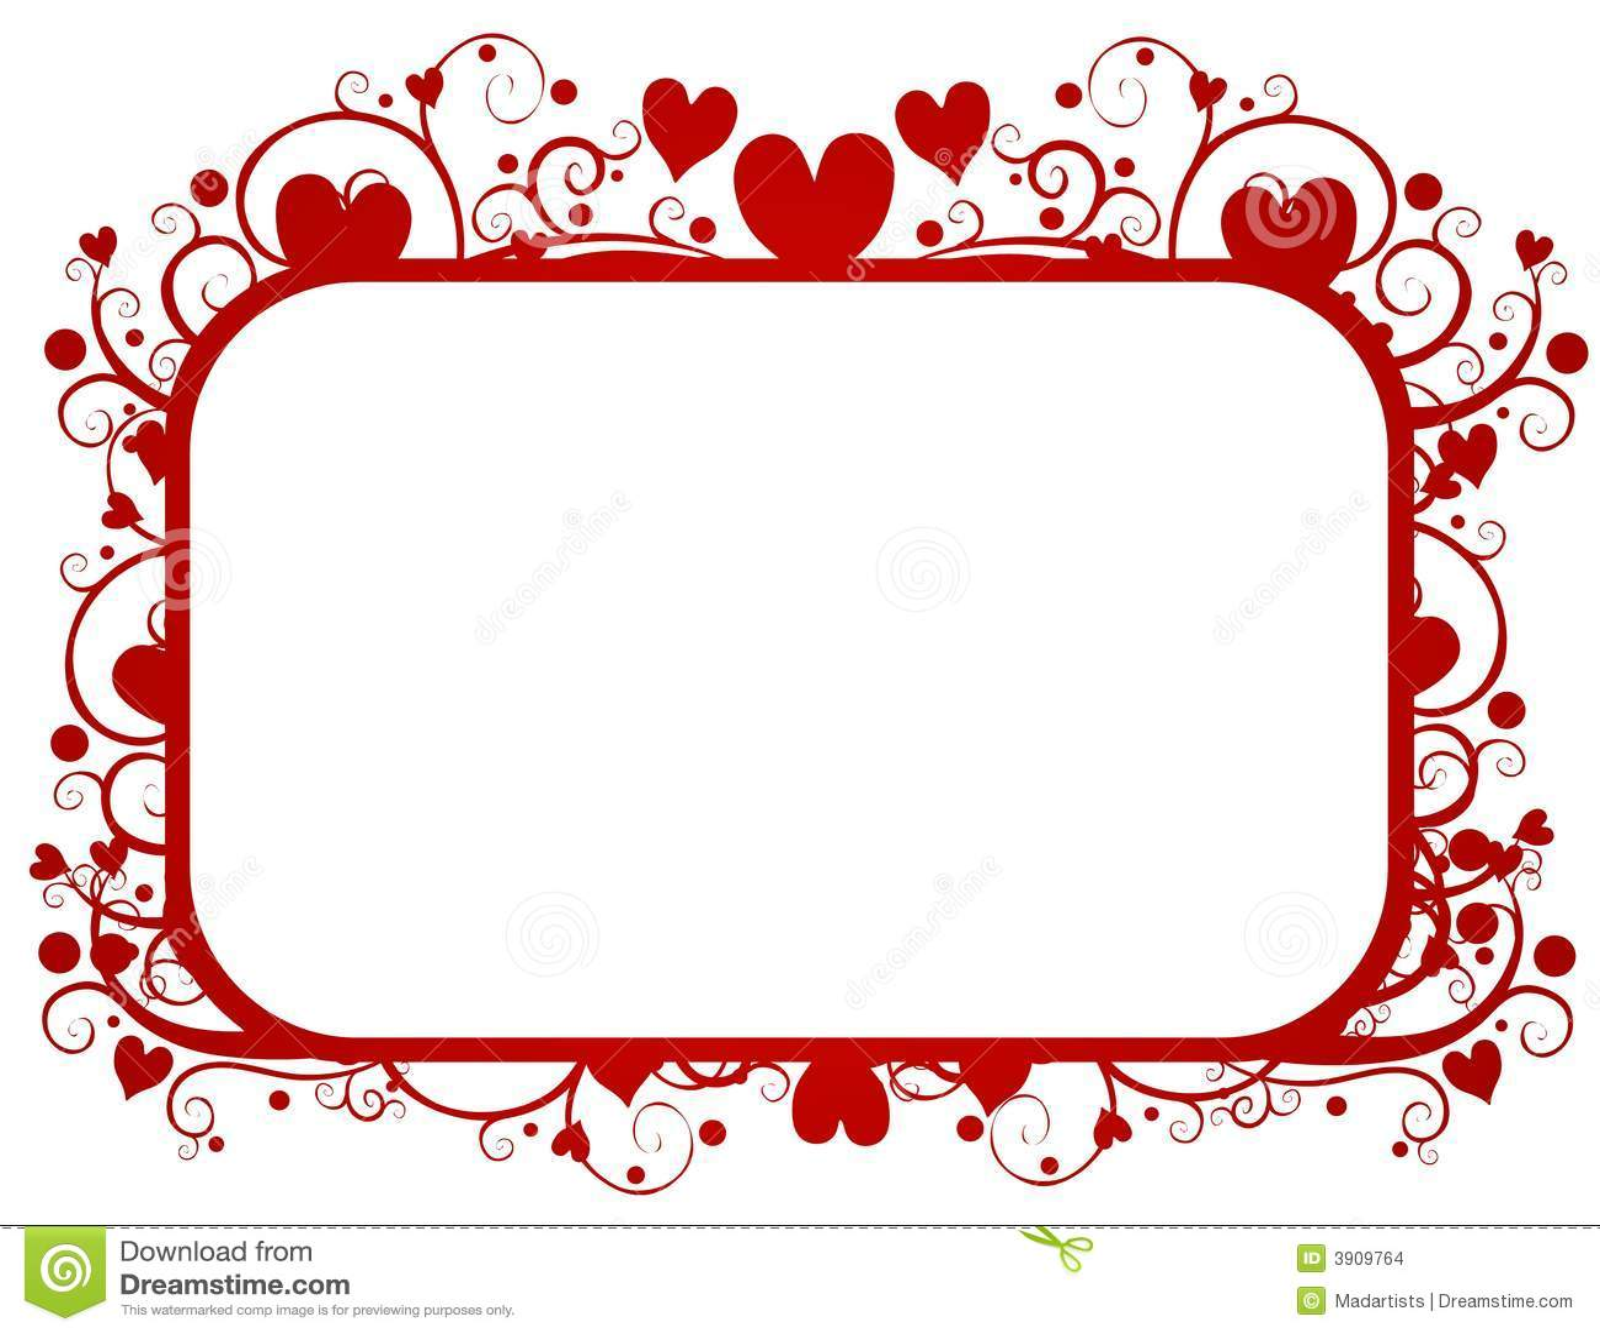 Red Hearts Swirls Valentine S Day Frame Stock Illustration